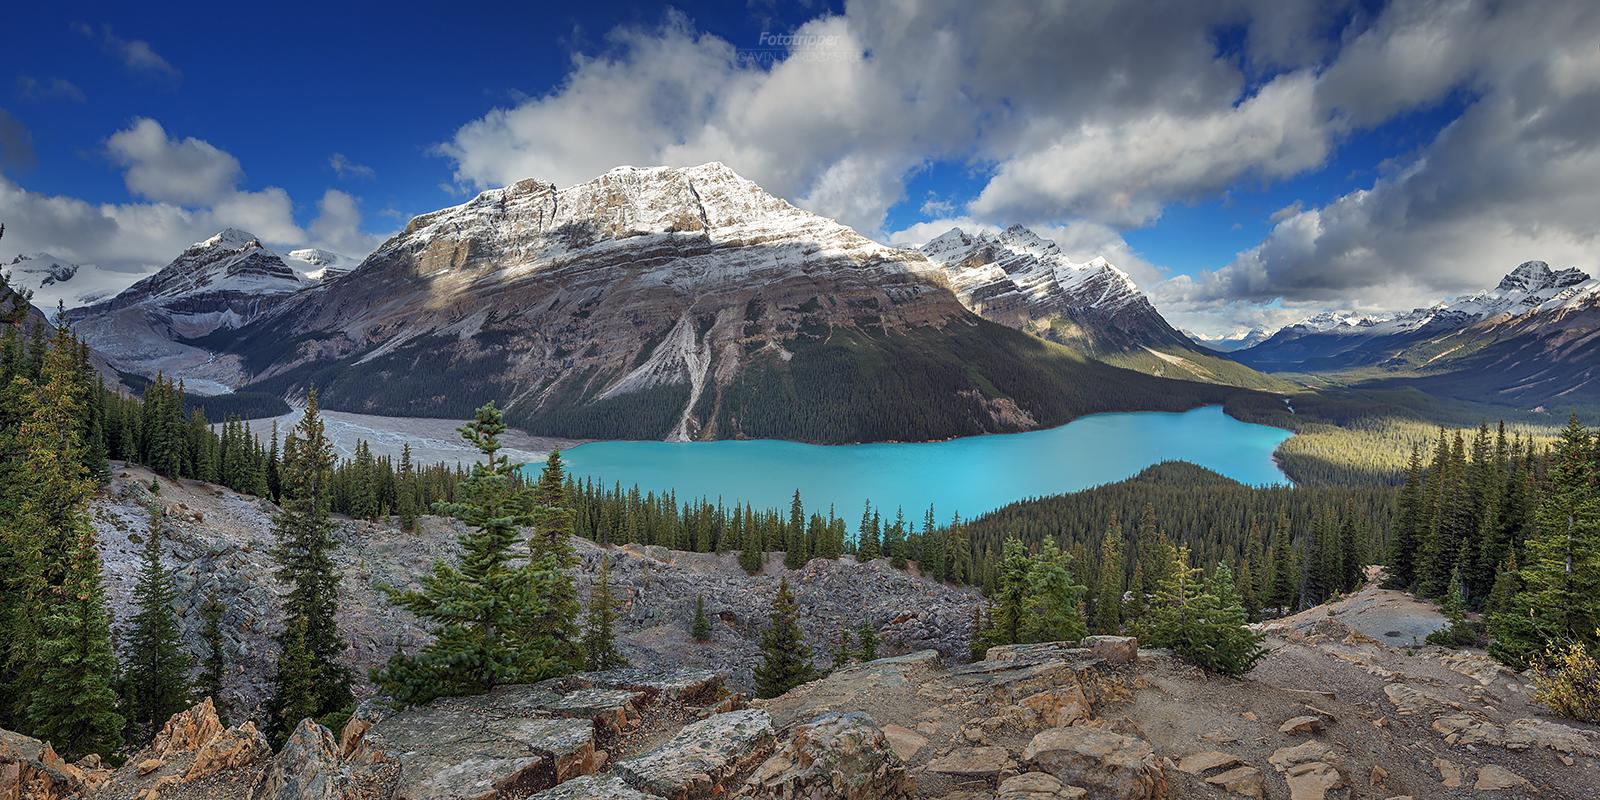 Peyto Lake Banff photo workshops in Septermber